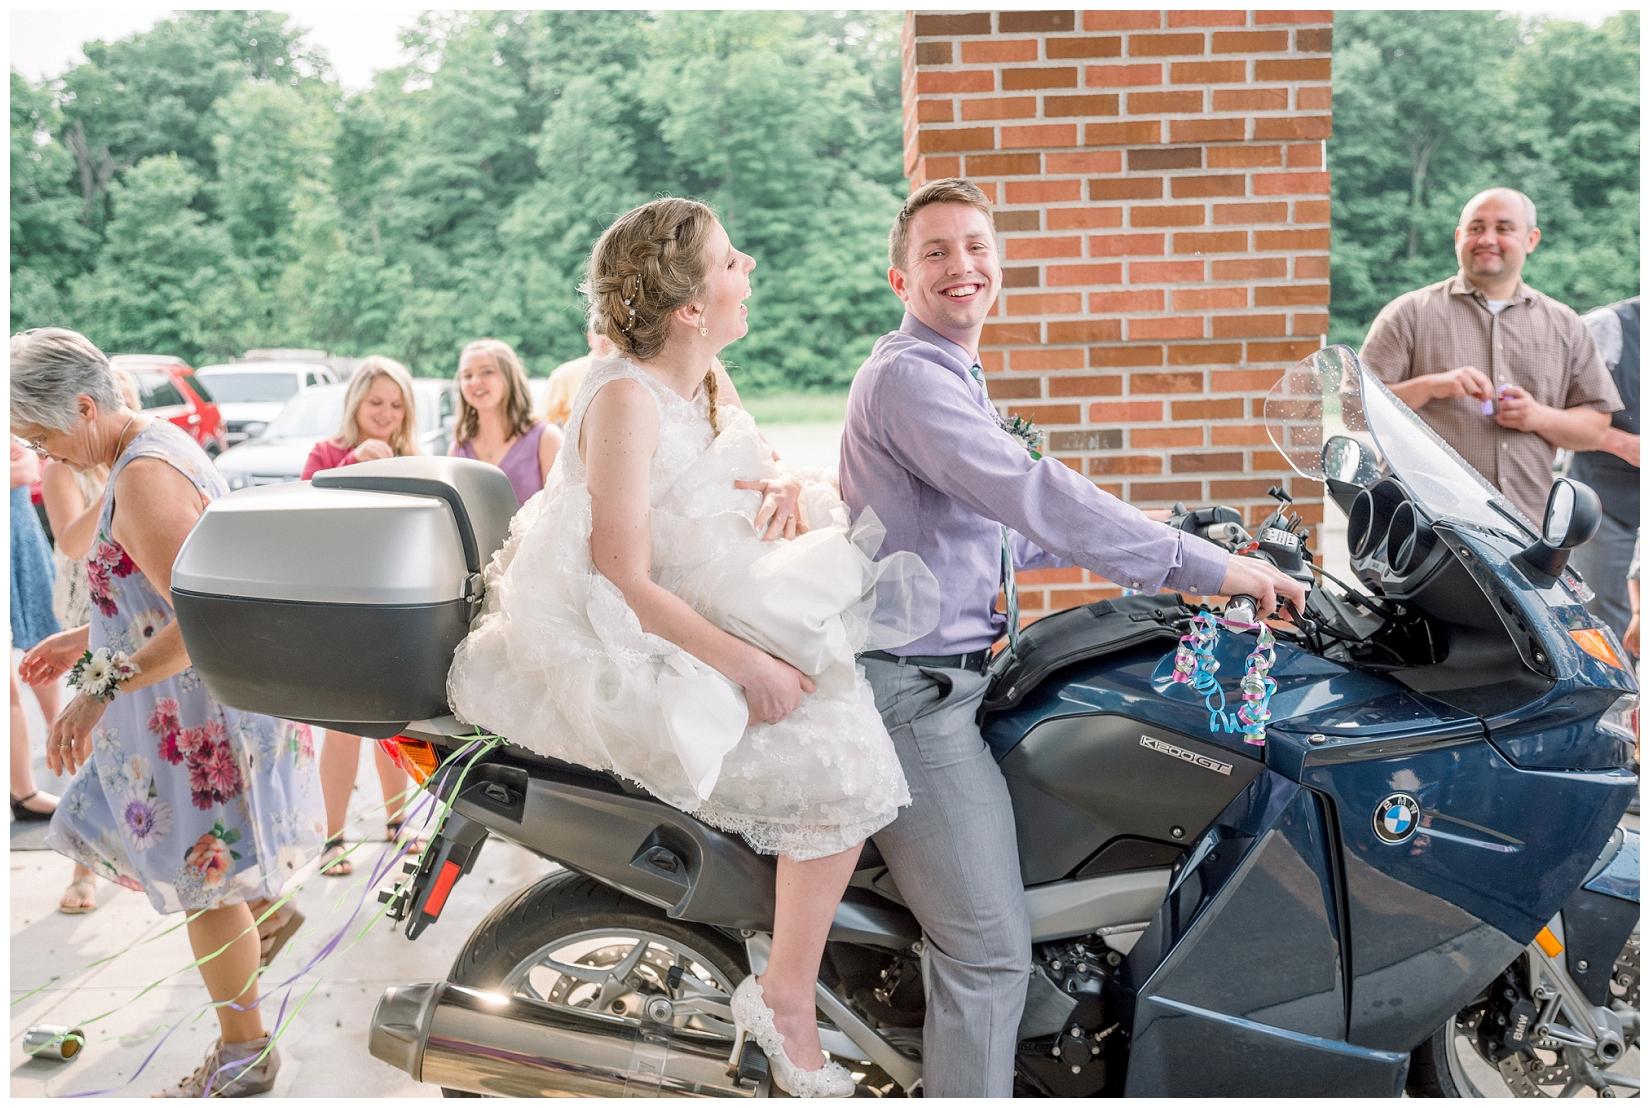 cat-alkire-wedding-photographer-indiana-chicago-indianapolis-fort-wayne_1332.jpg